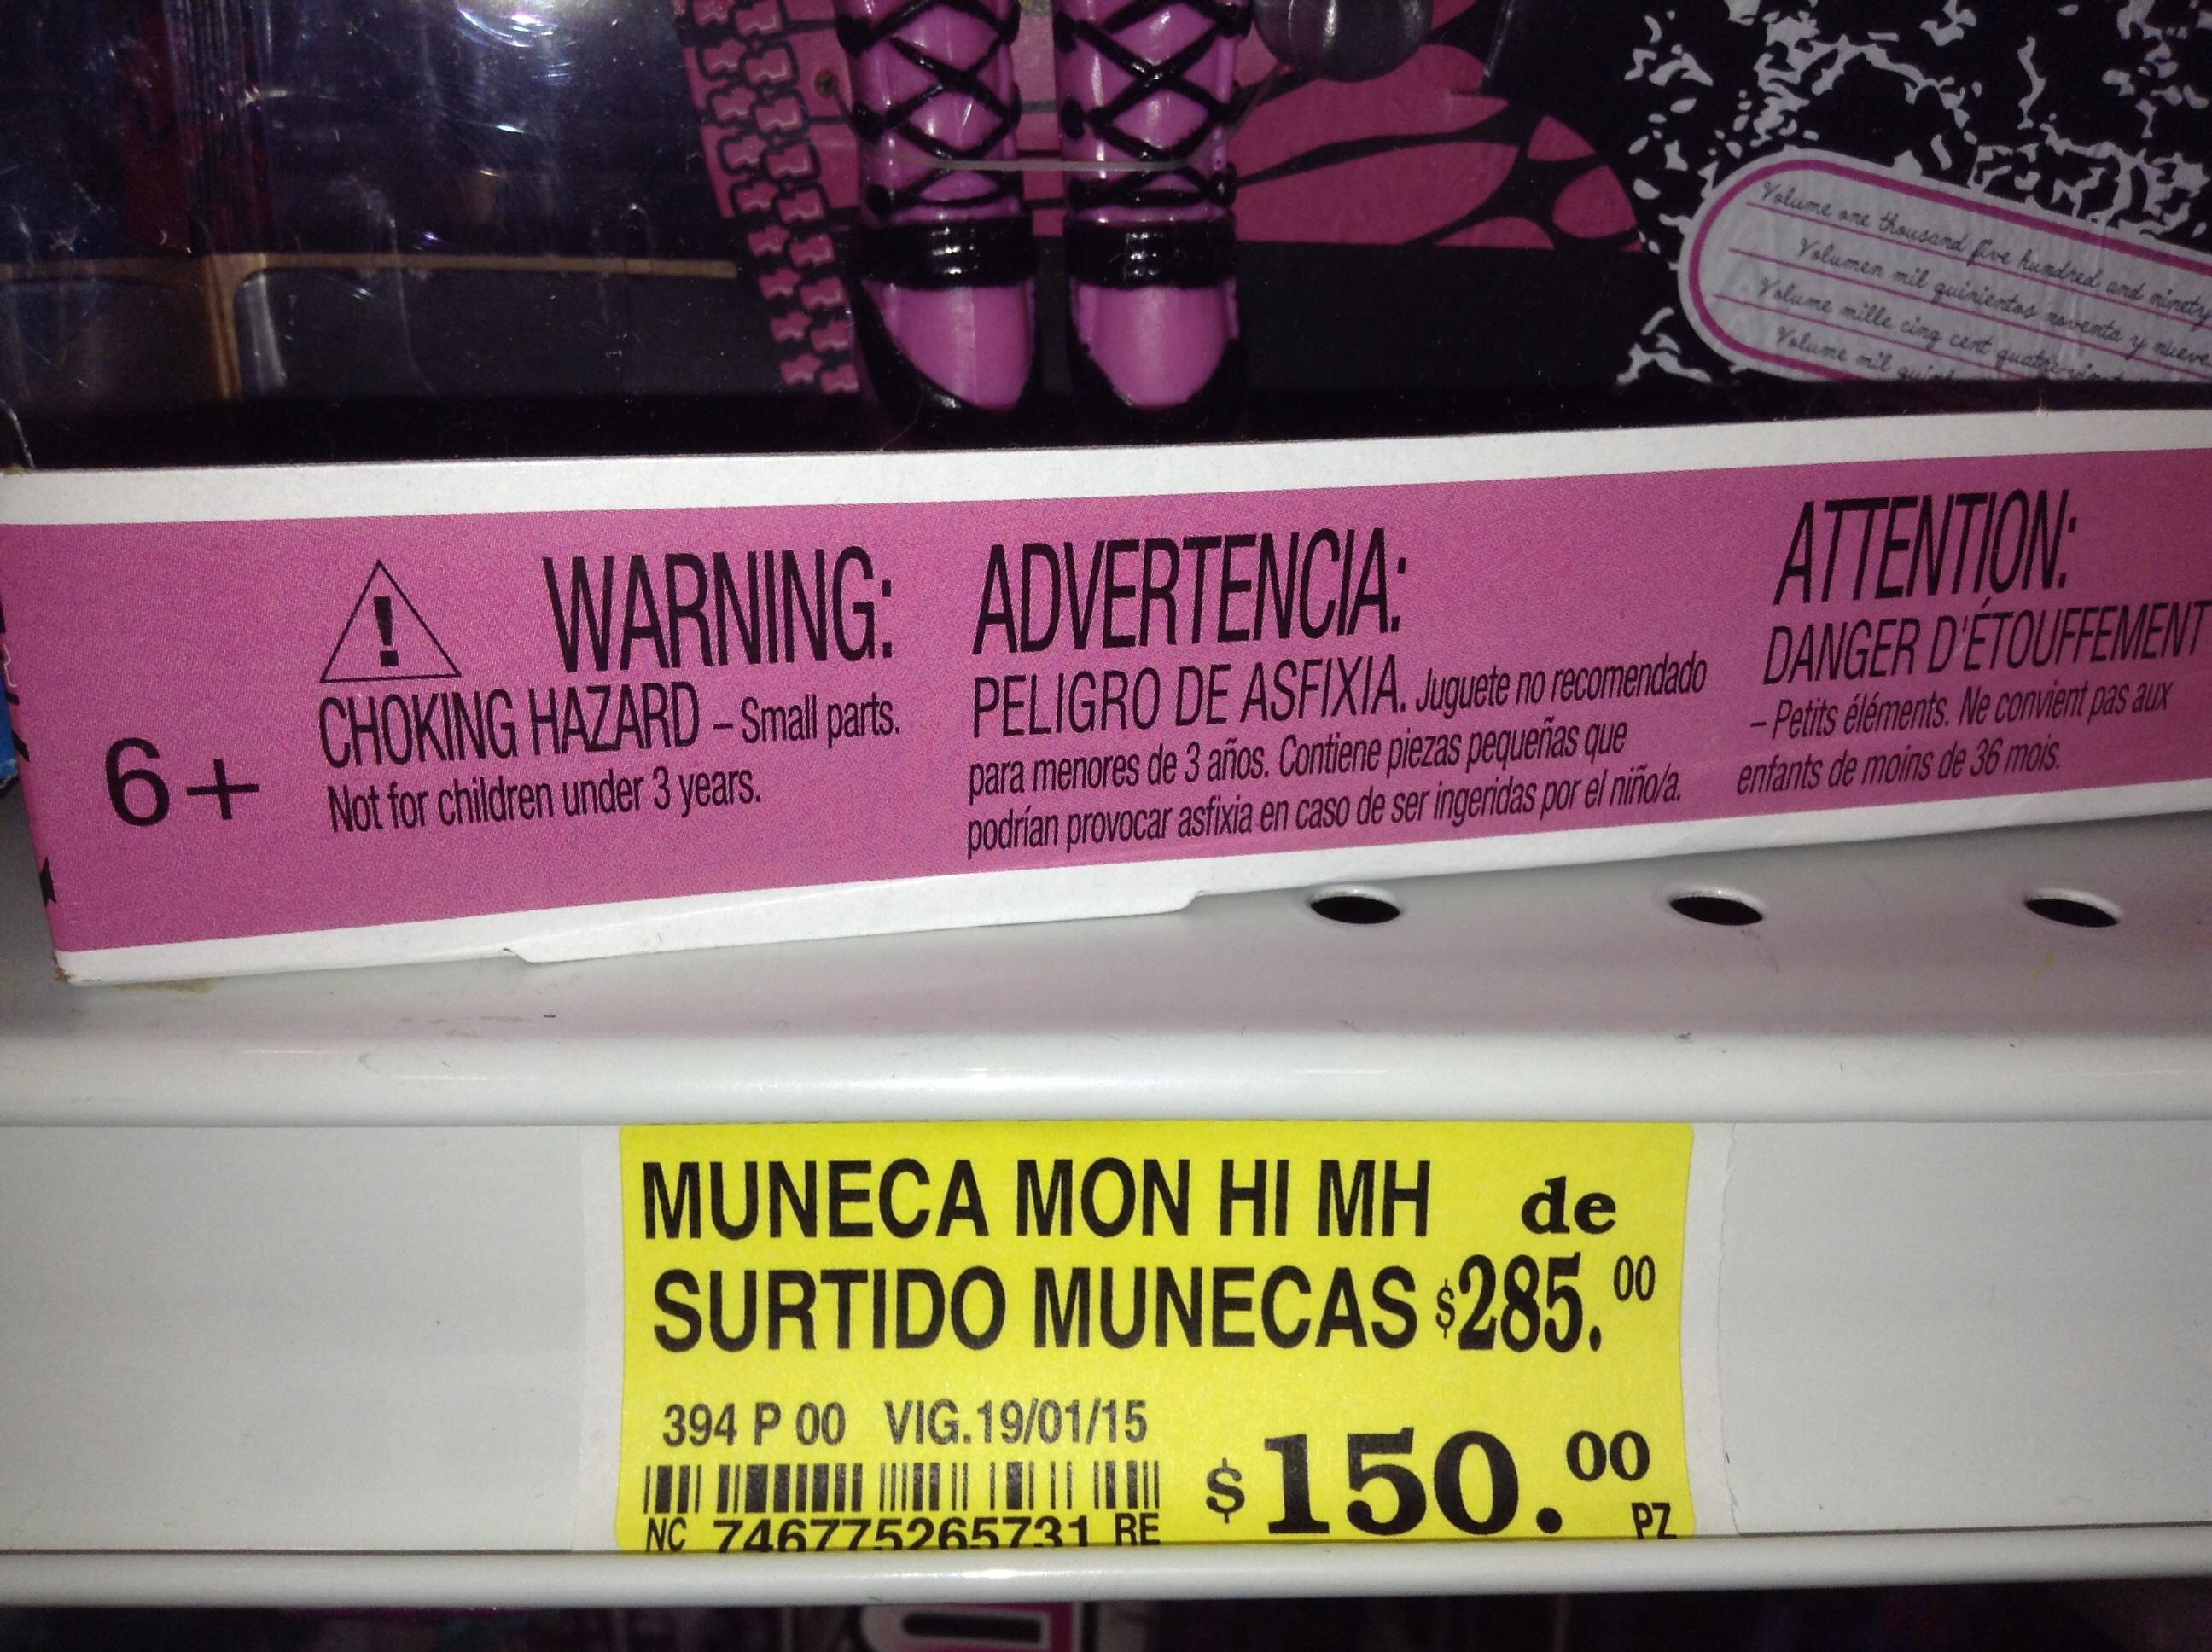 Soriana: variedad muñecas Monster High $150